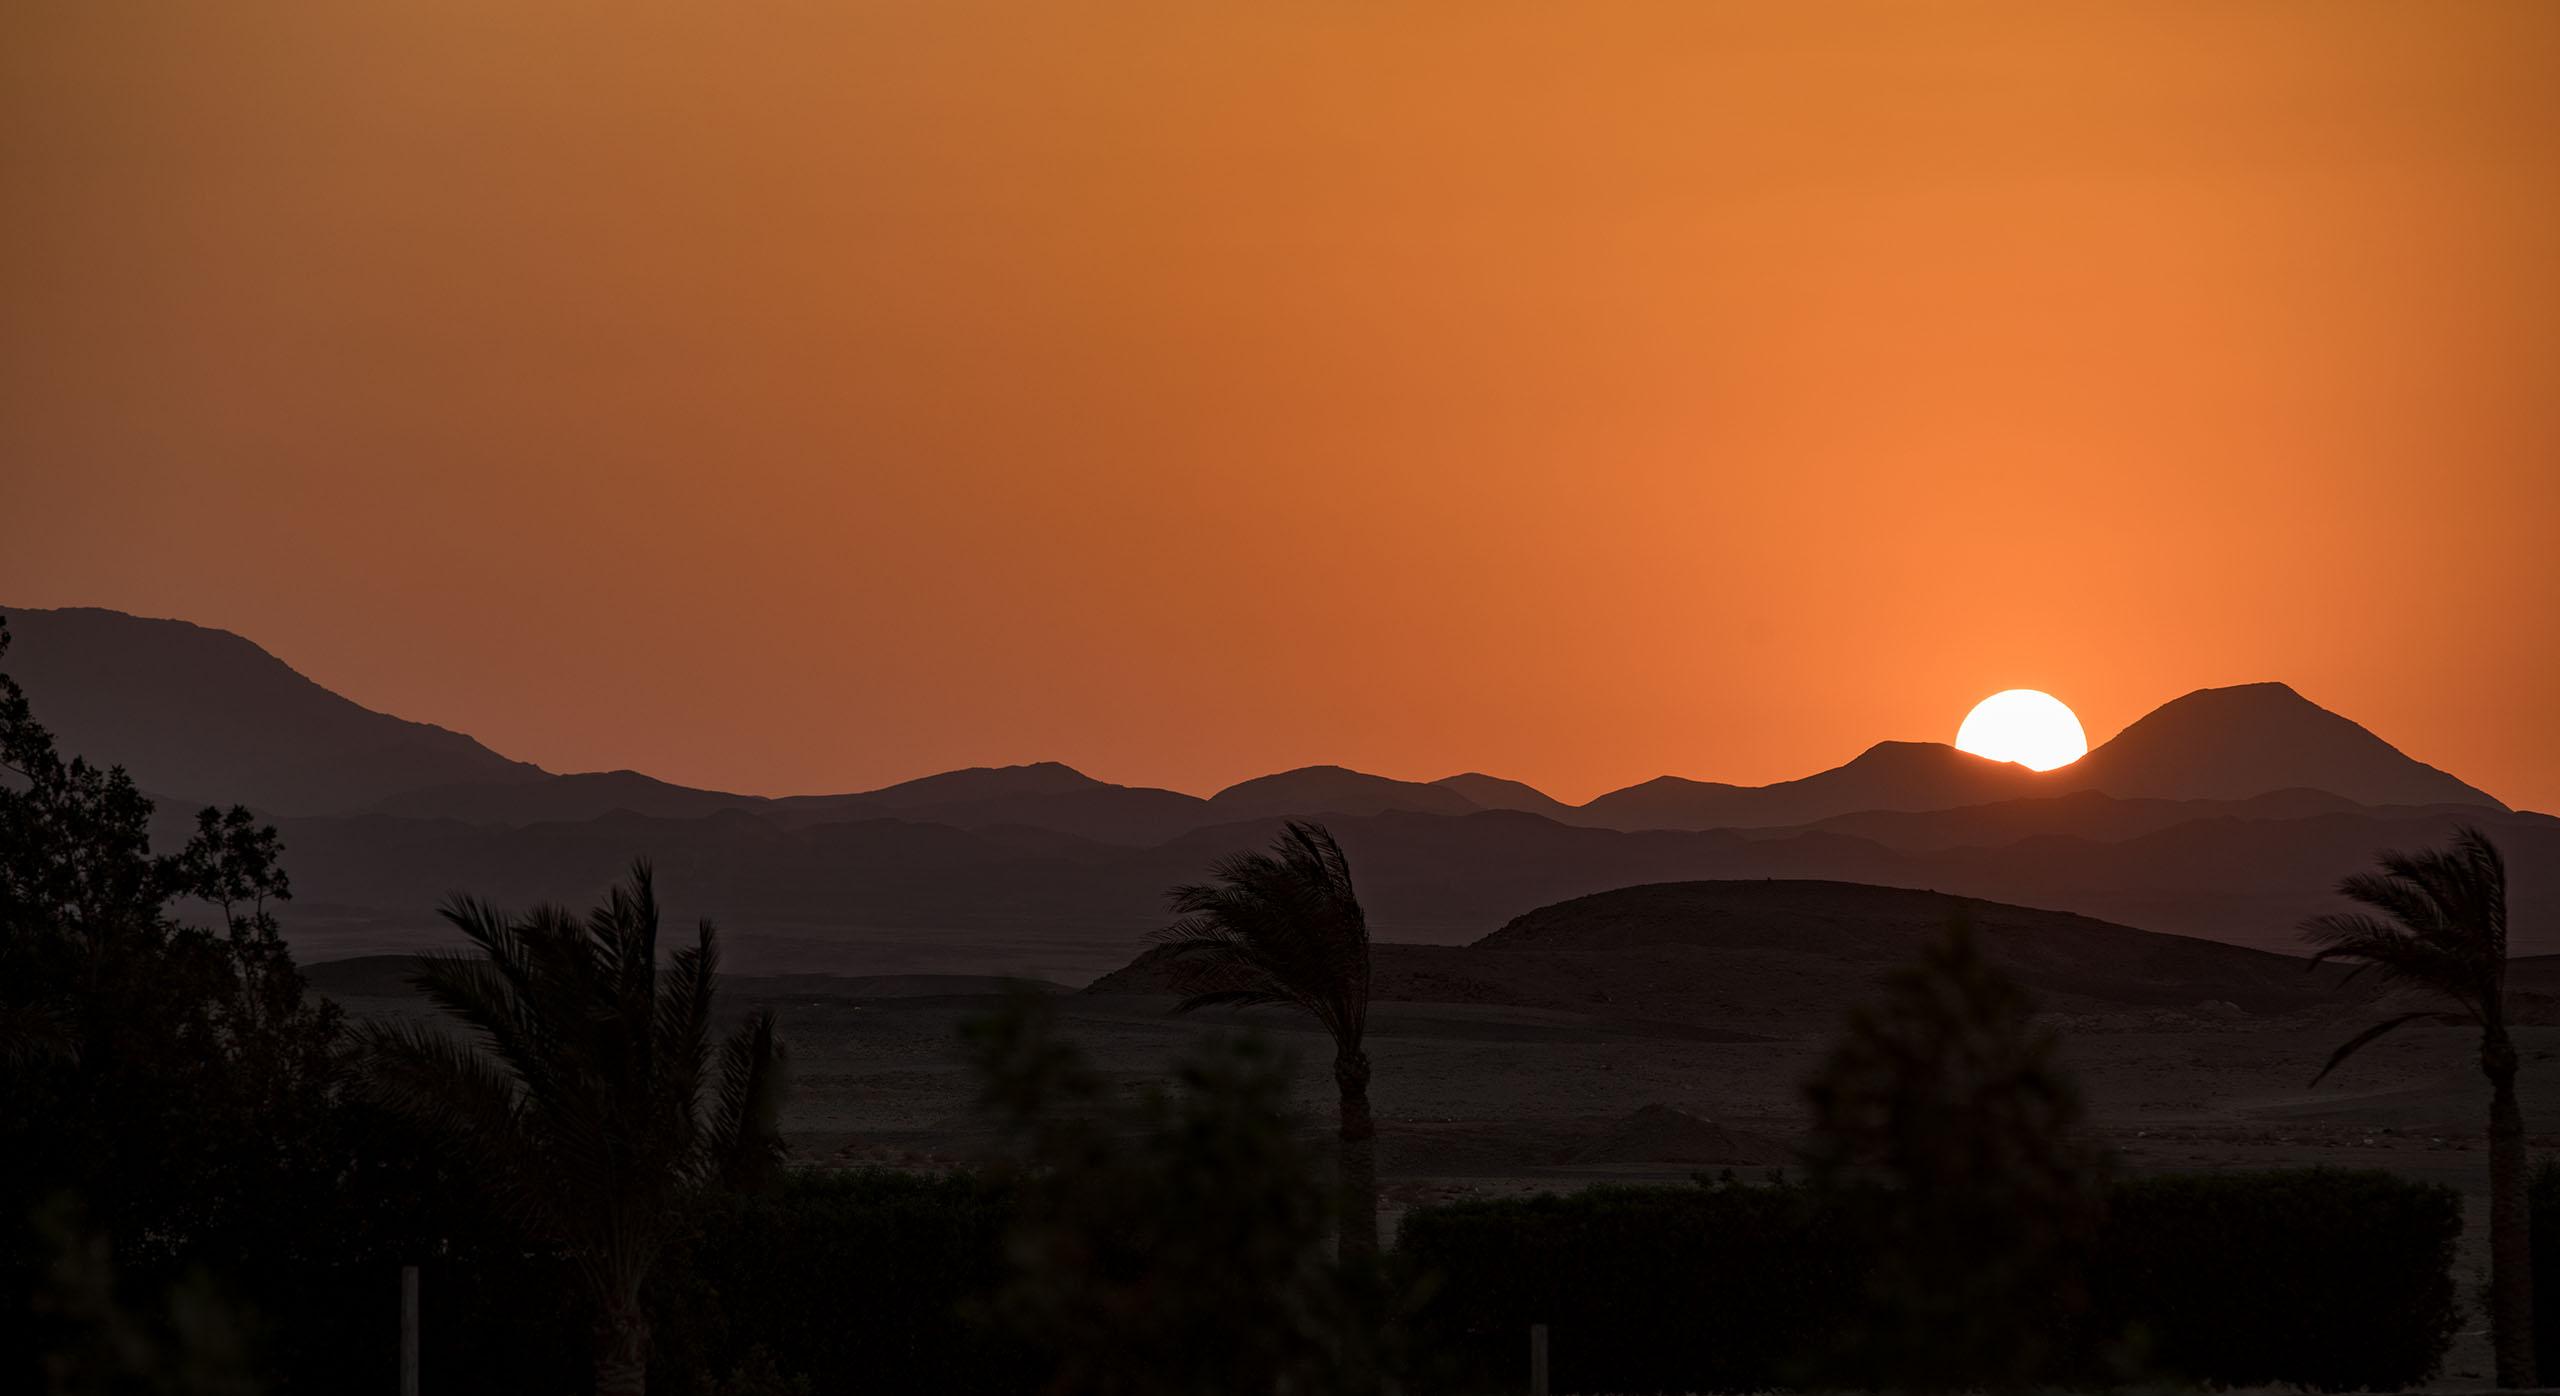 Sonnenuntergang - Egypt, Ägyptenreise nach Marsa Alam 2018. © aadhoc-media • Thomas Rohwedder